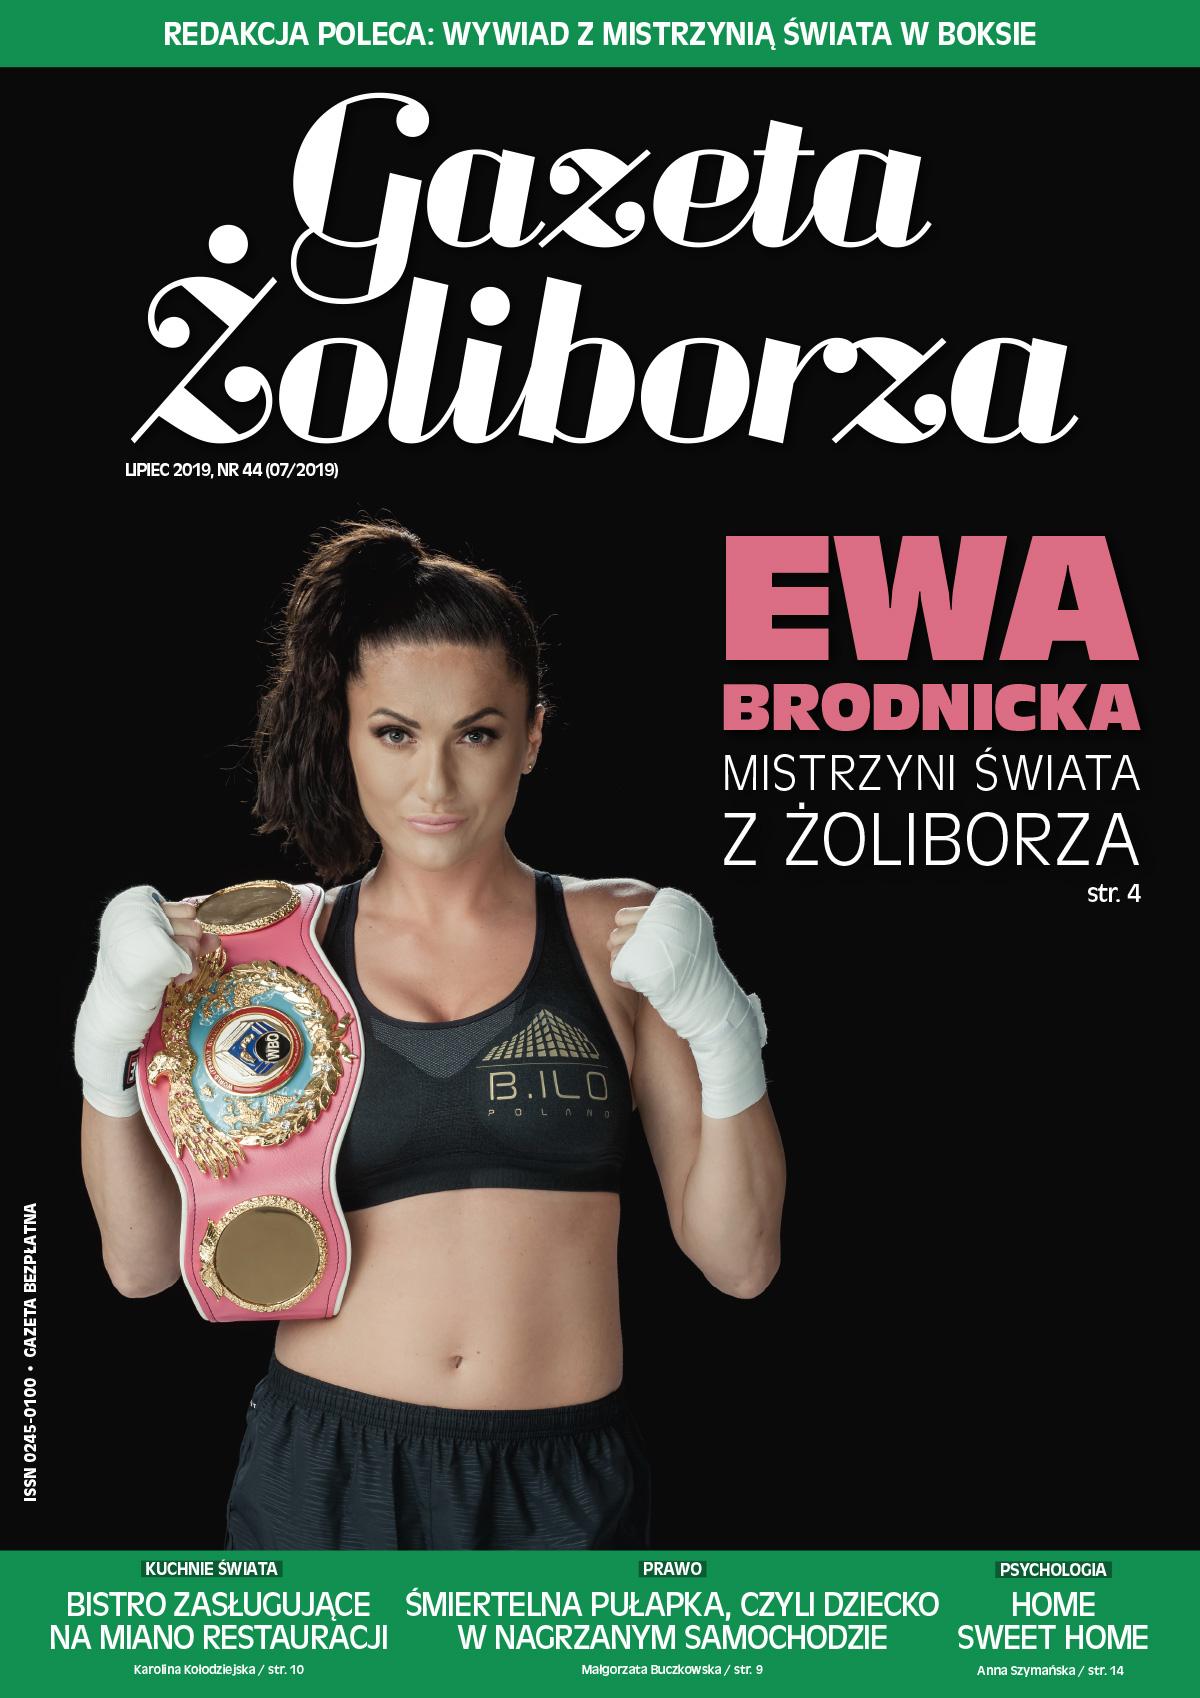 Gazeta Żoliborza - 07/2019 (44)